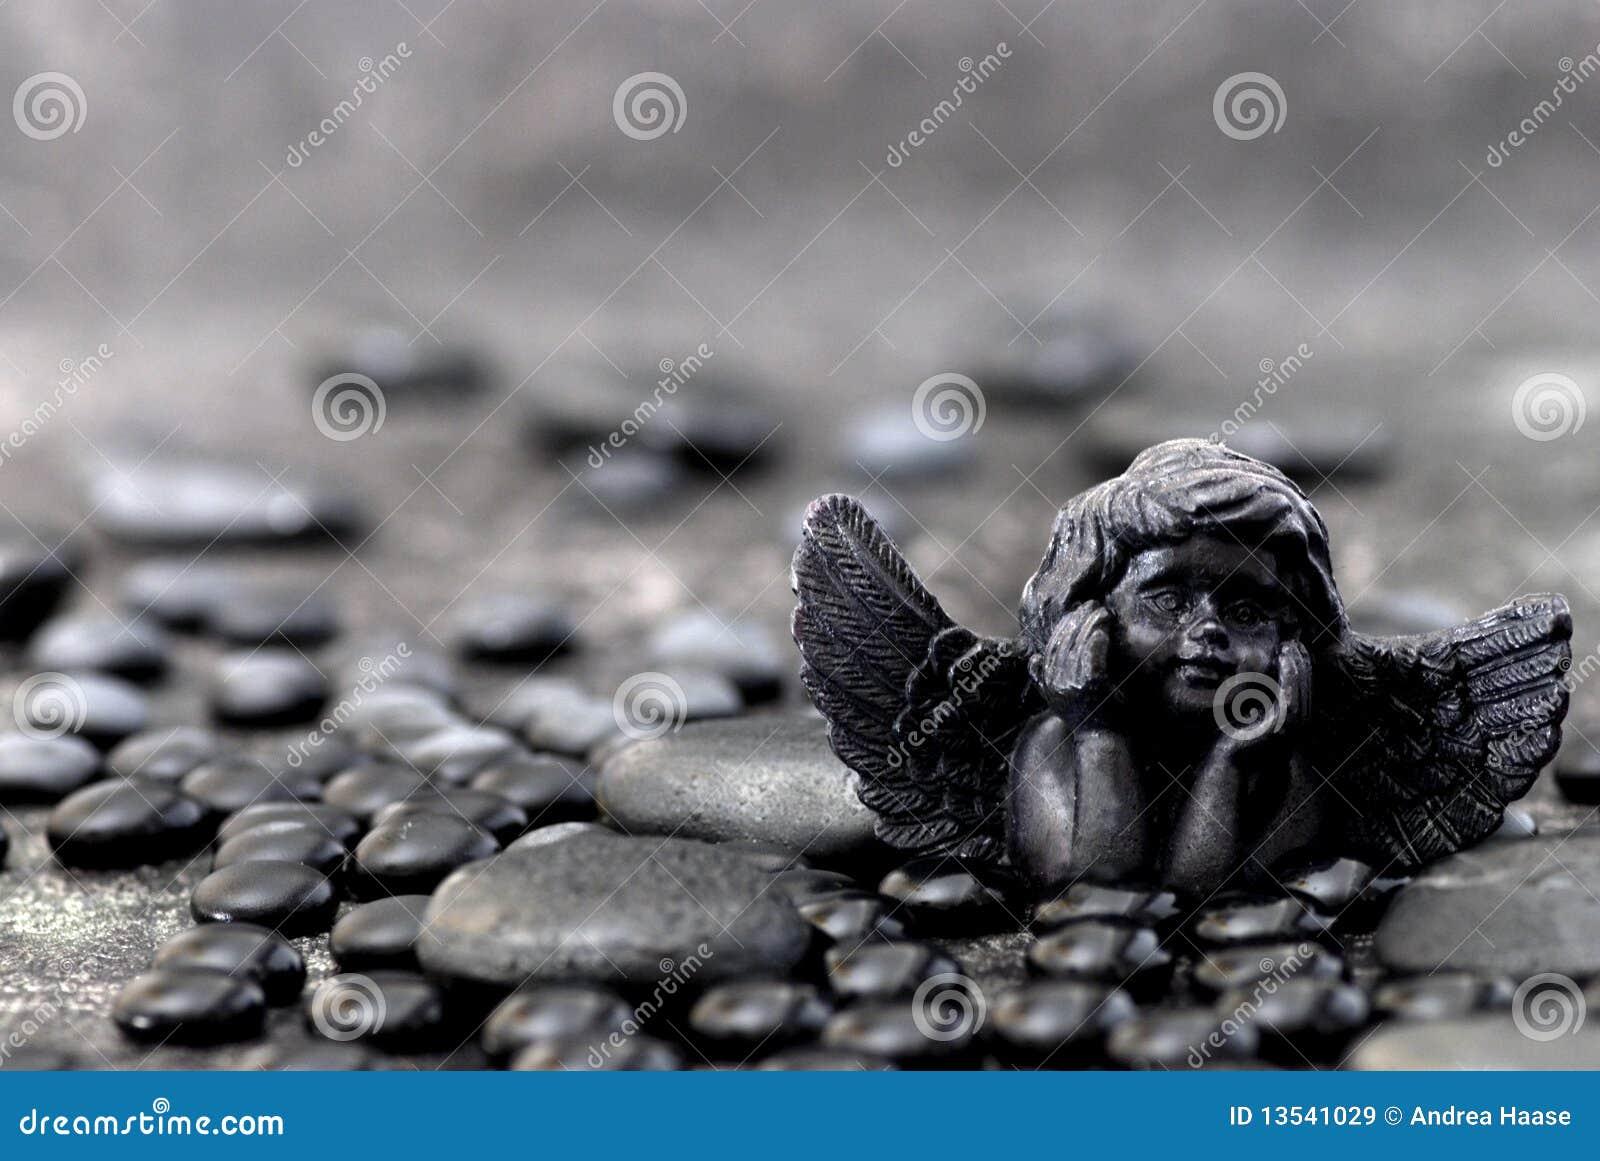 Black angel and stone